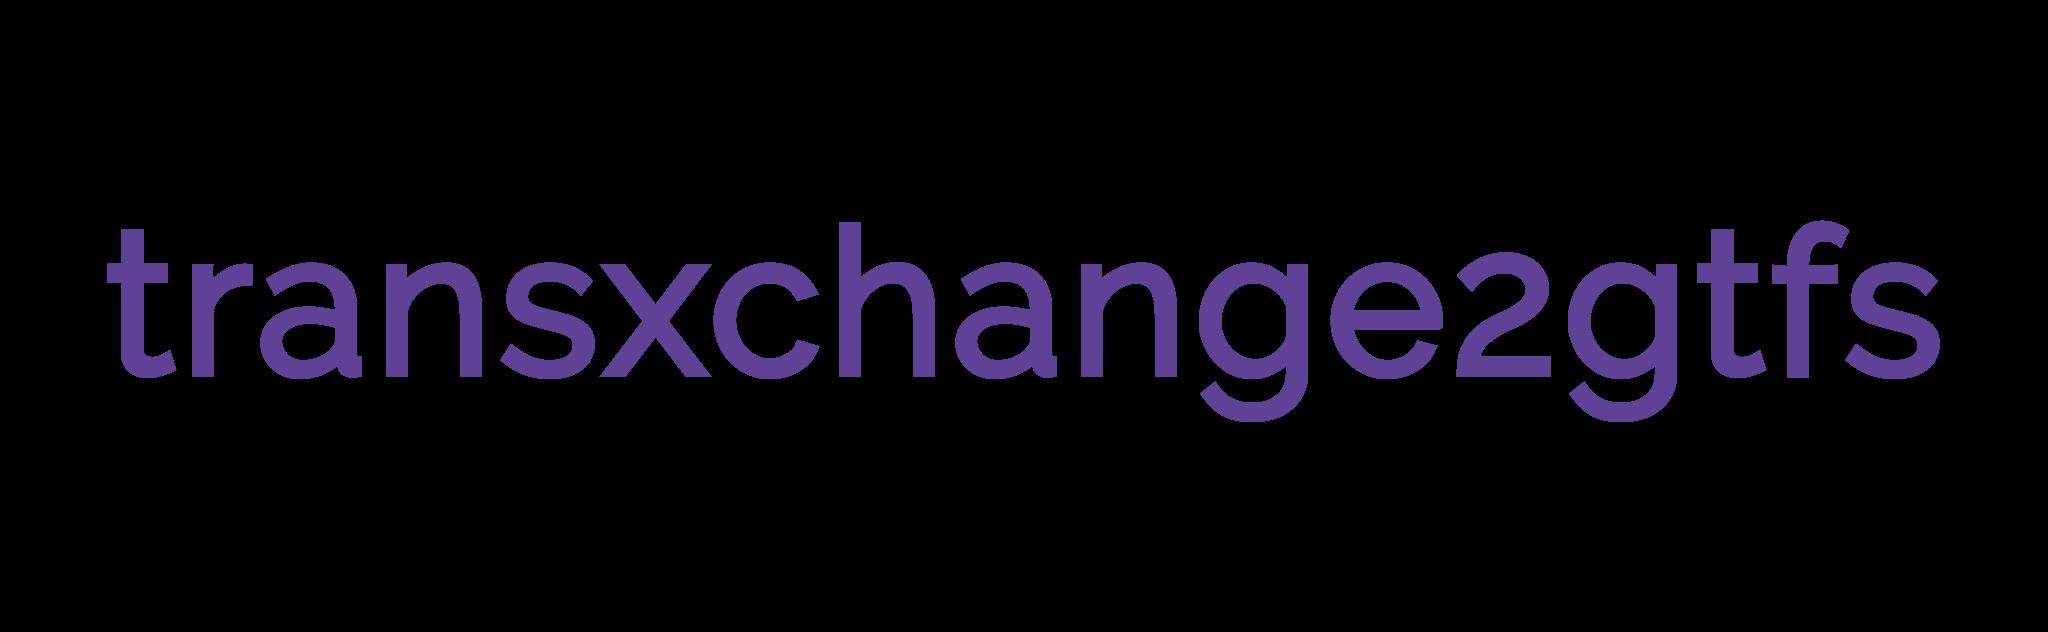 transxchange2gtfs